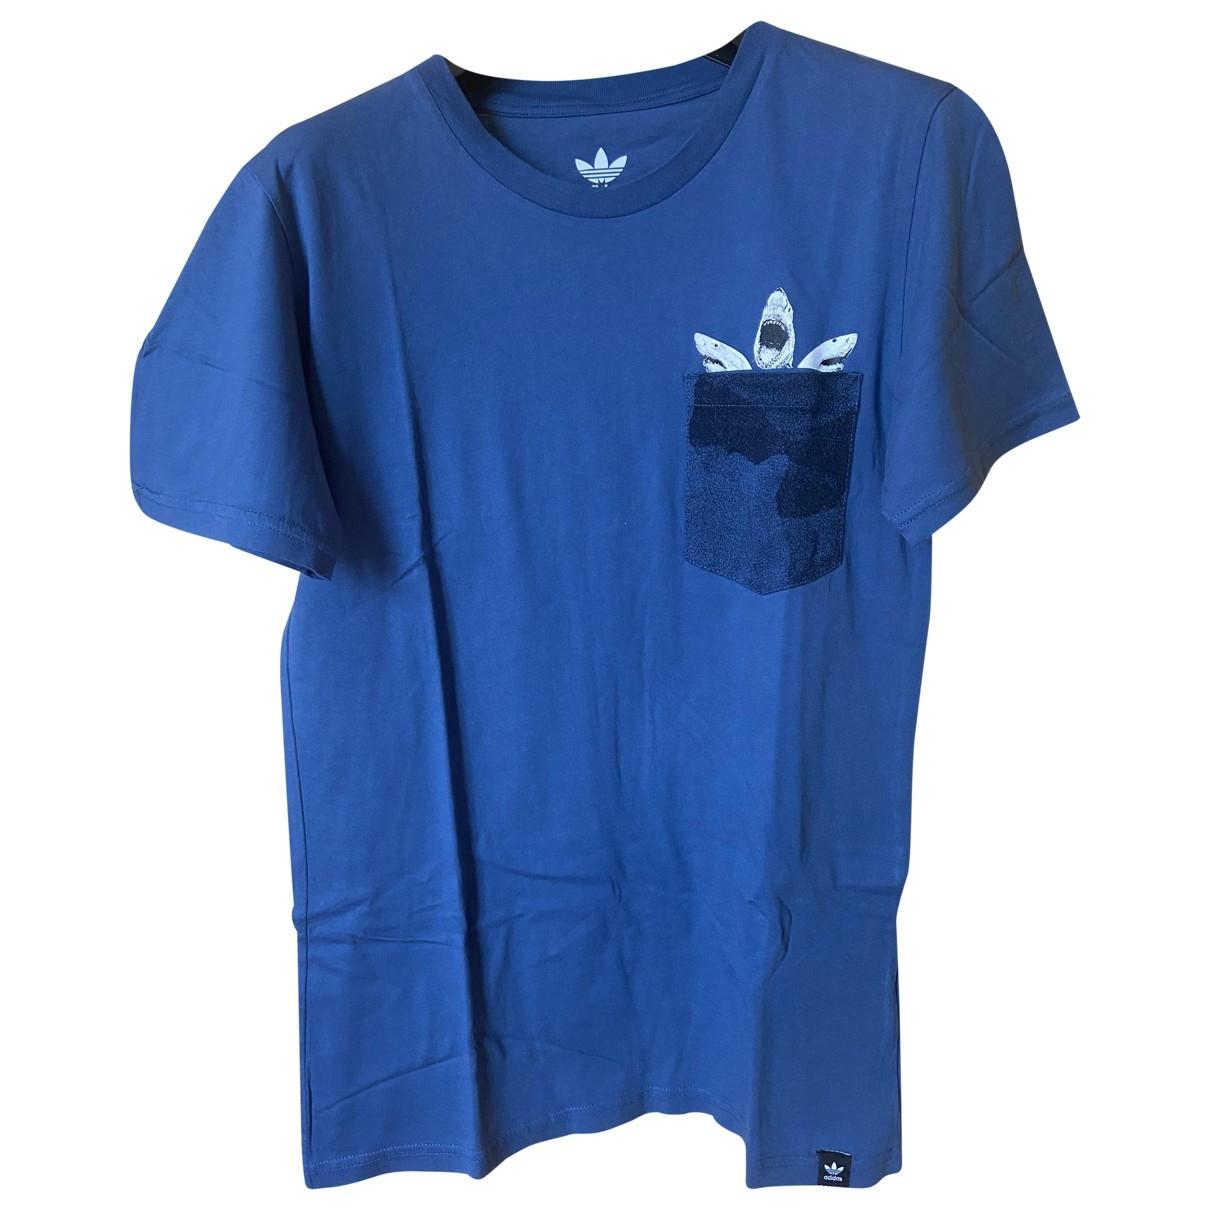 Adidas \N Blue Cotton T-shirts for Men S International